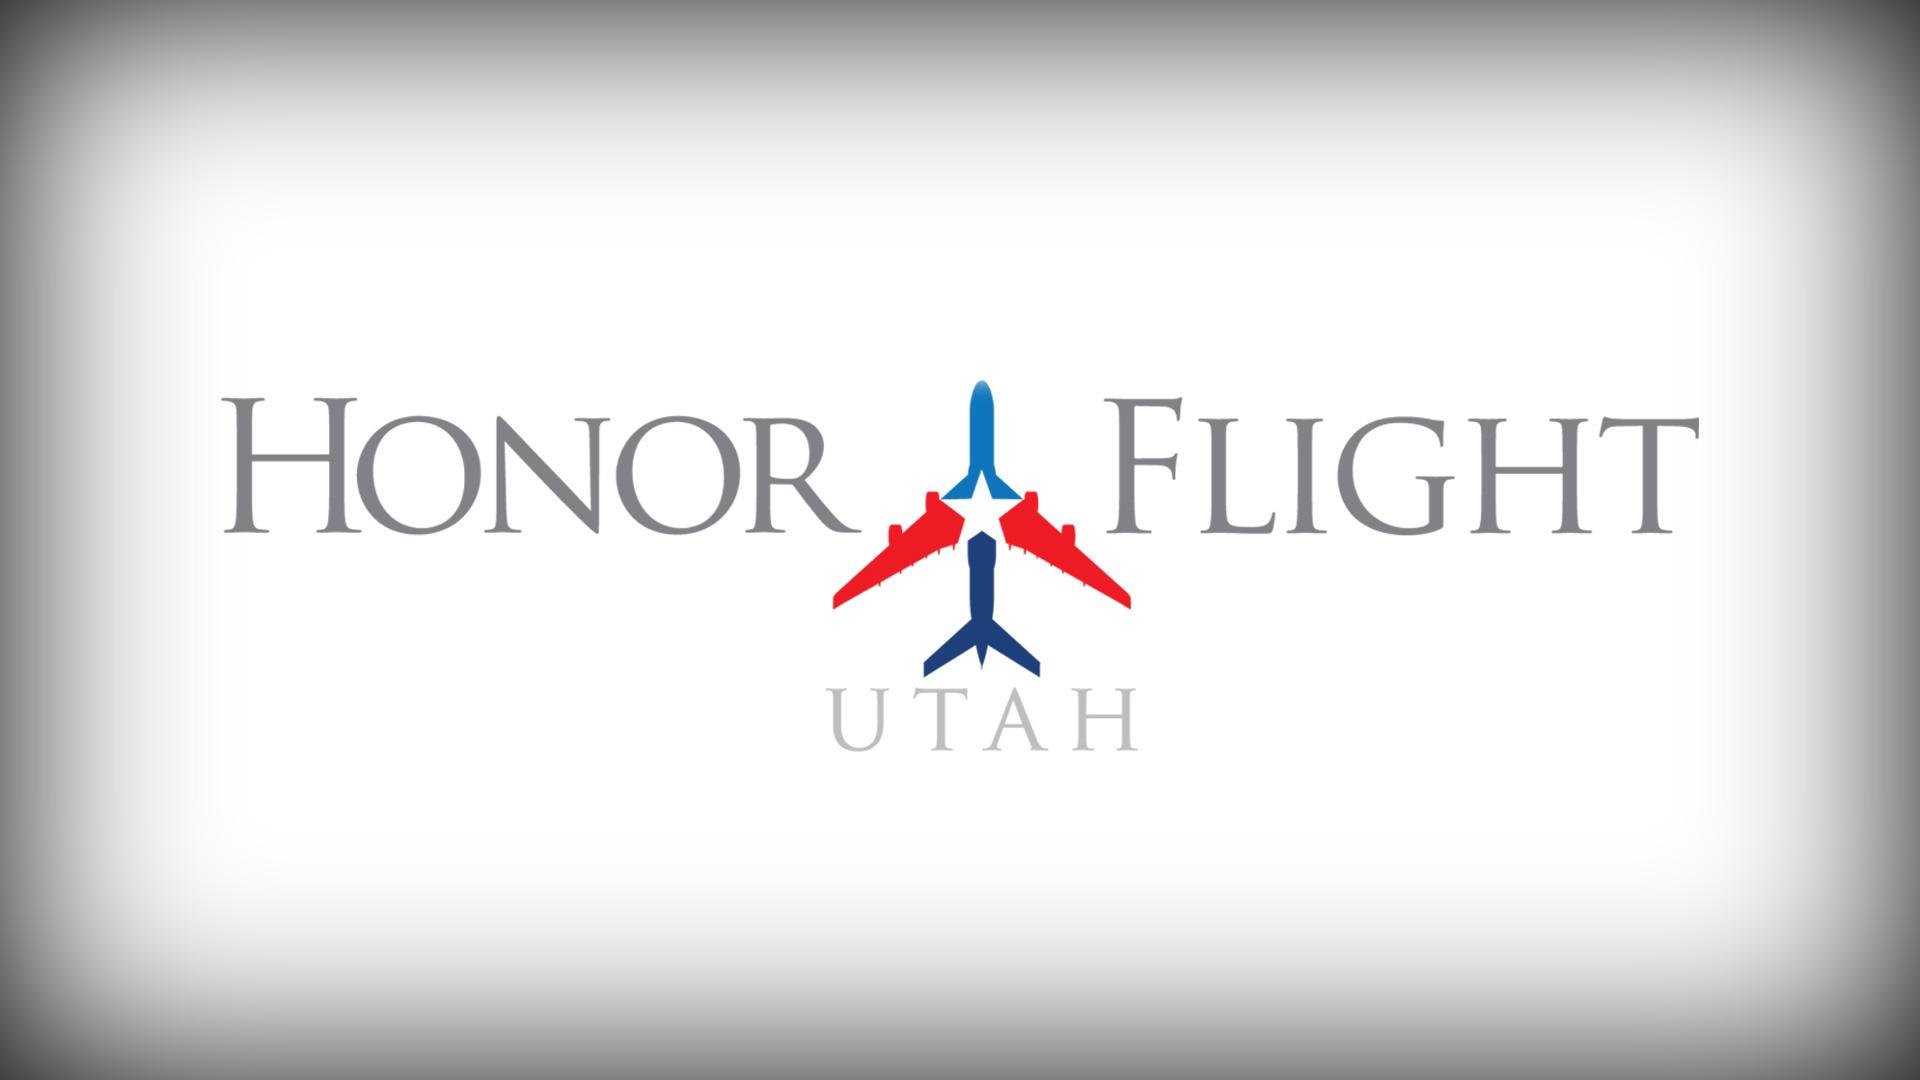 The Neil Simon Players will be performing at The Honor Flight on June 6th! #UtahHonorFlight #HonorFlight #WWIIVets #KoreanWarVets